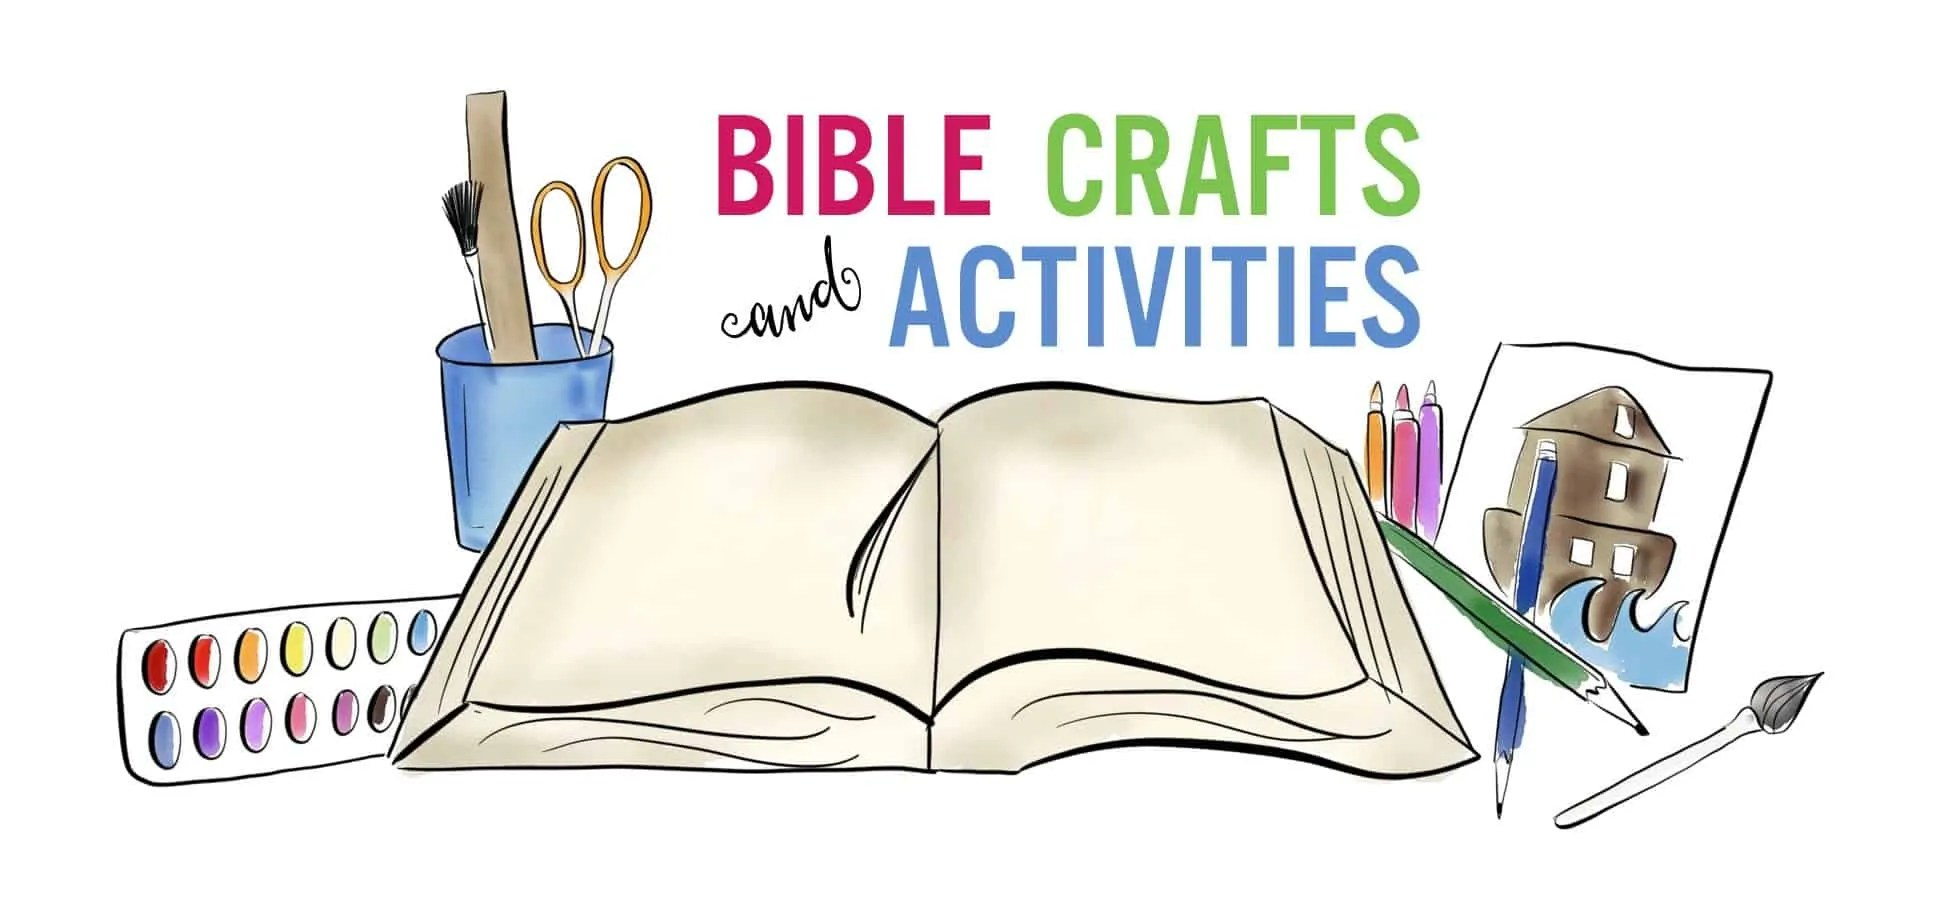 Sunday School Crafts For Samuel Listens To God